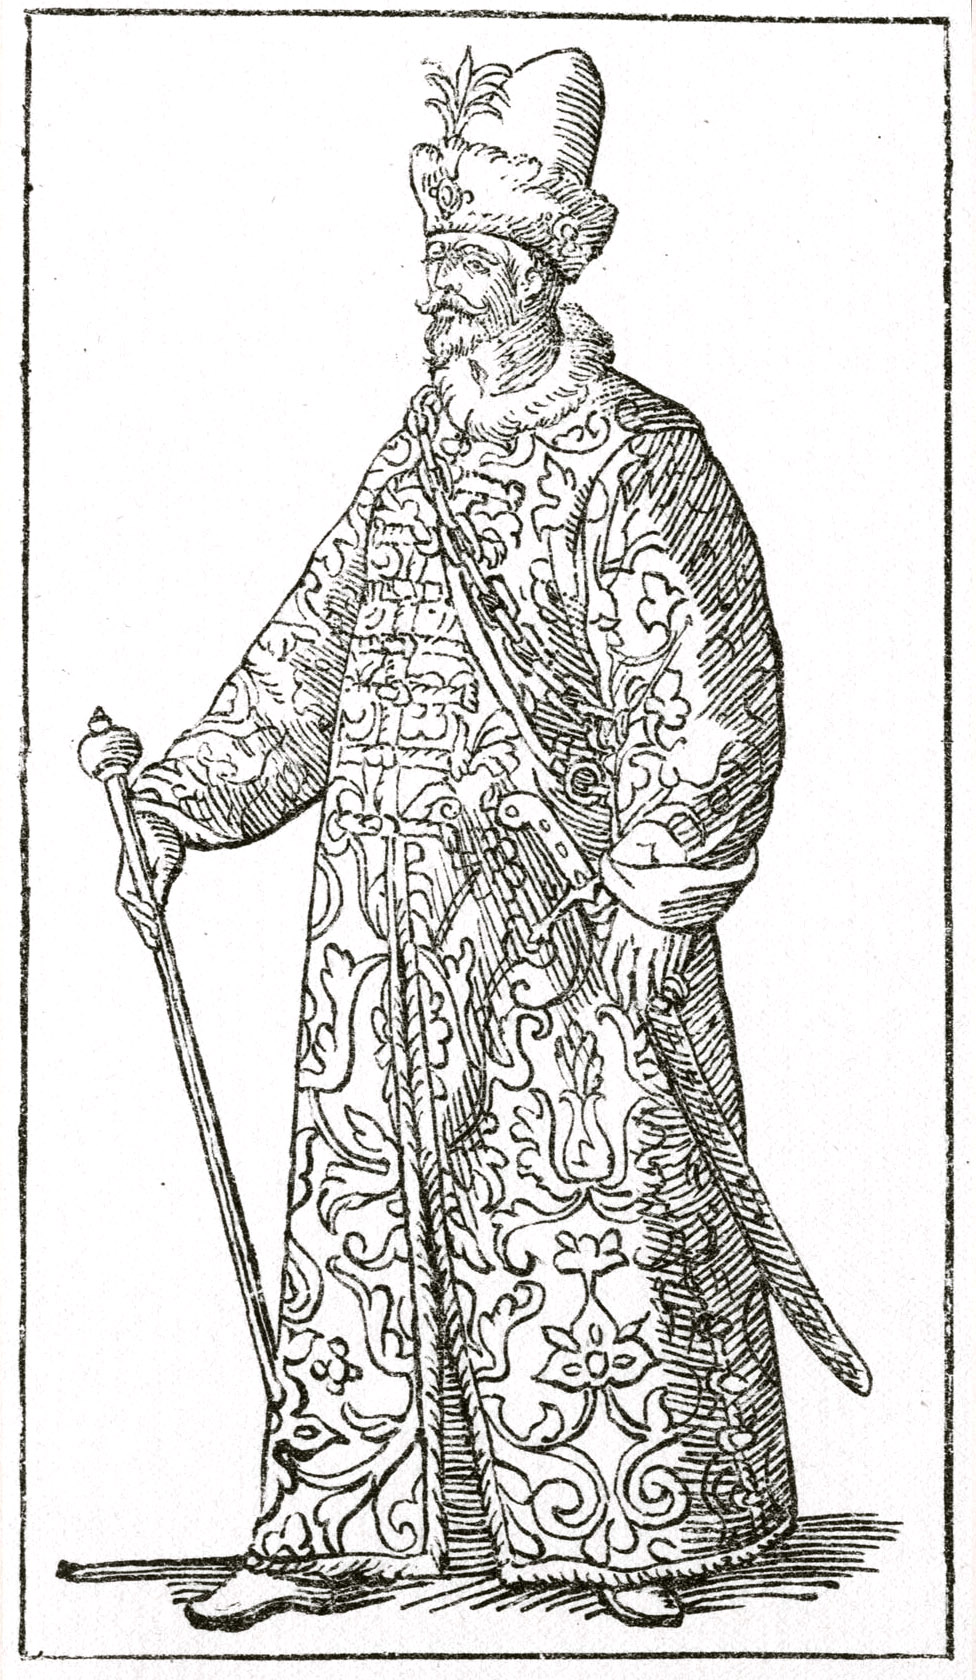 144. Гравюра из книги Чезаре Вечеллио, 1598